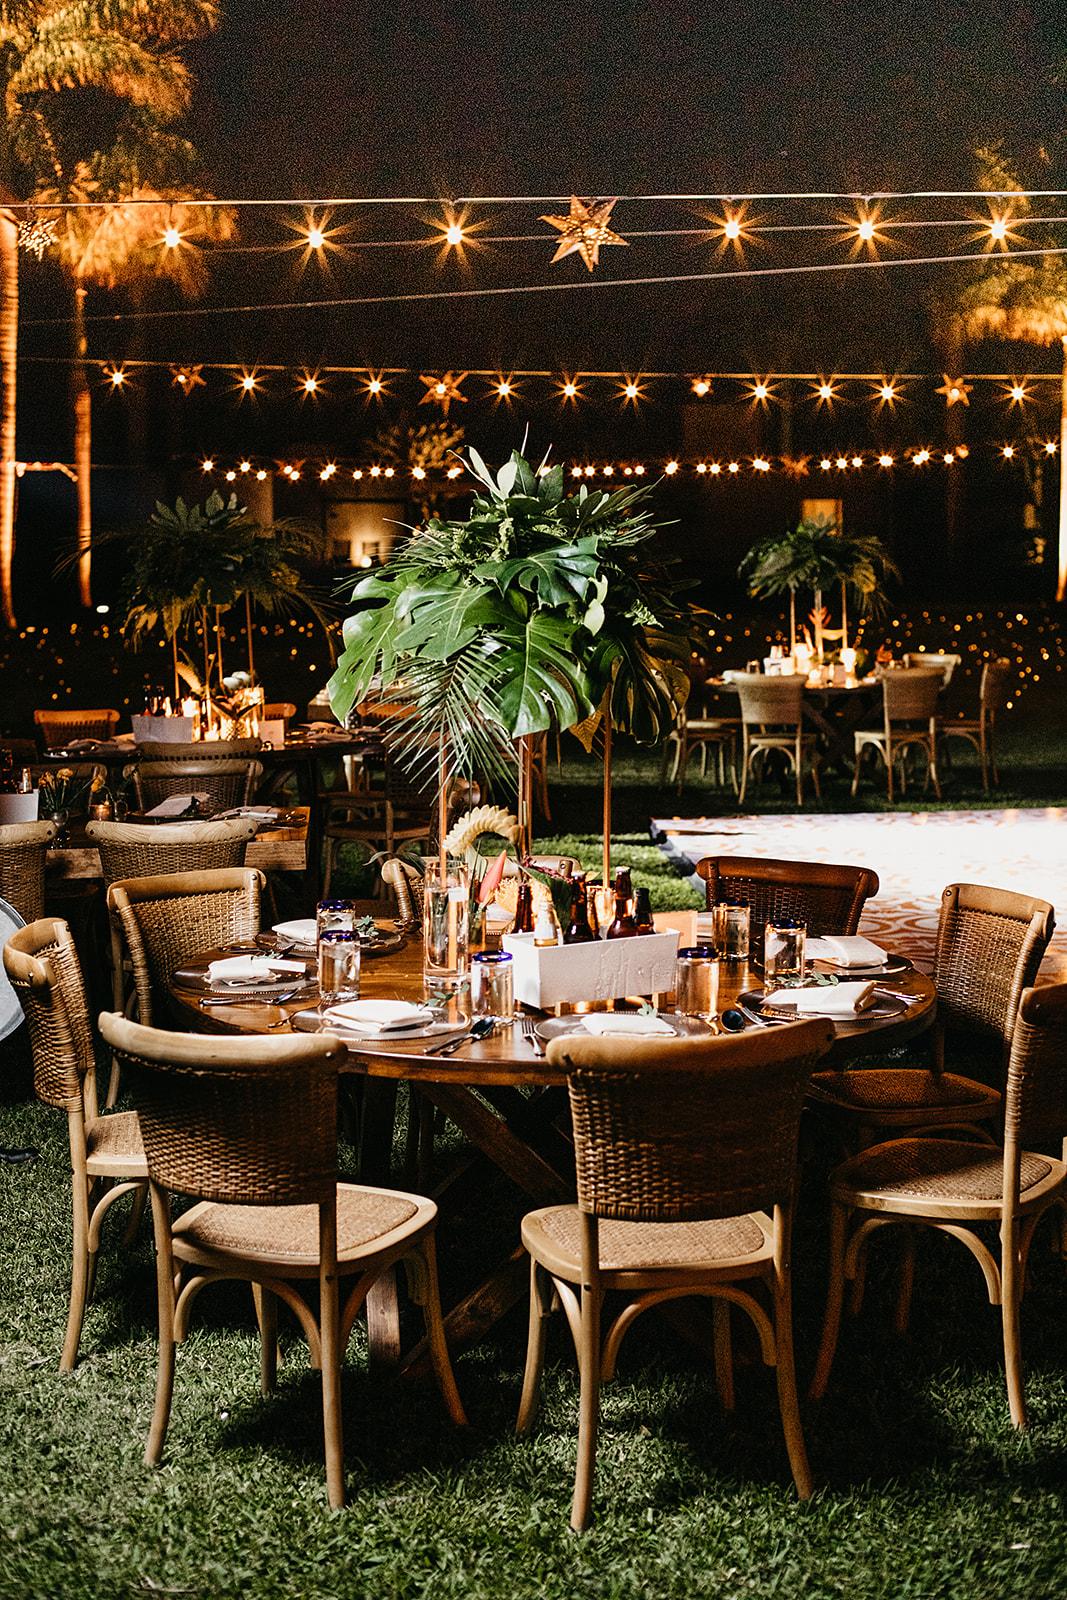 AmandaMarkus-Hacienda-Sac-Chich-Merida-Wedding-673_websize.jpg